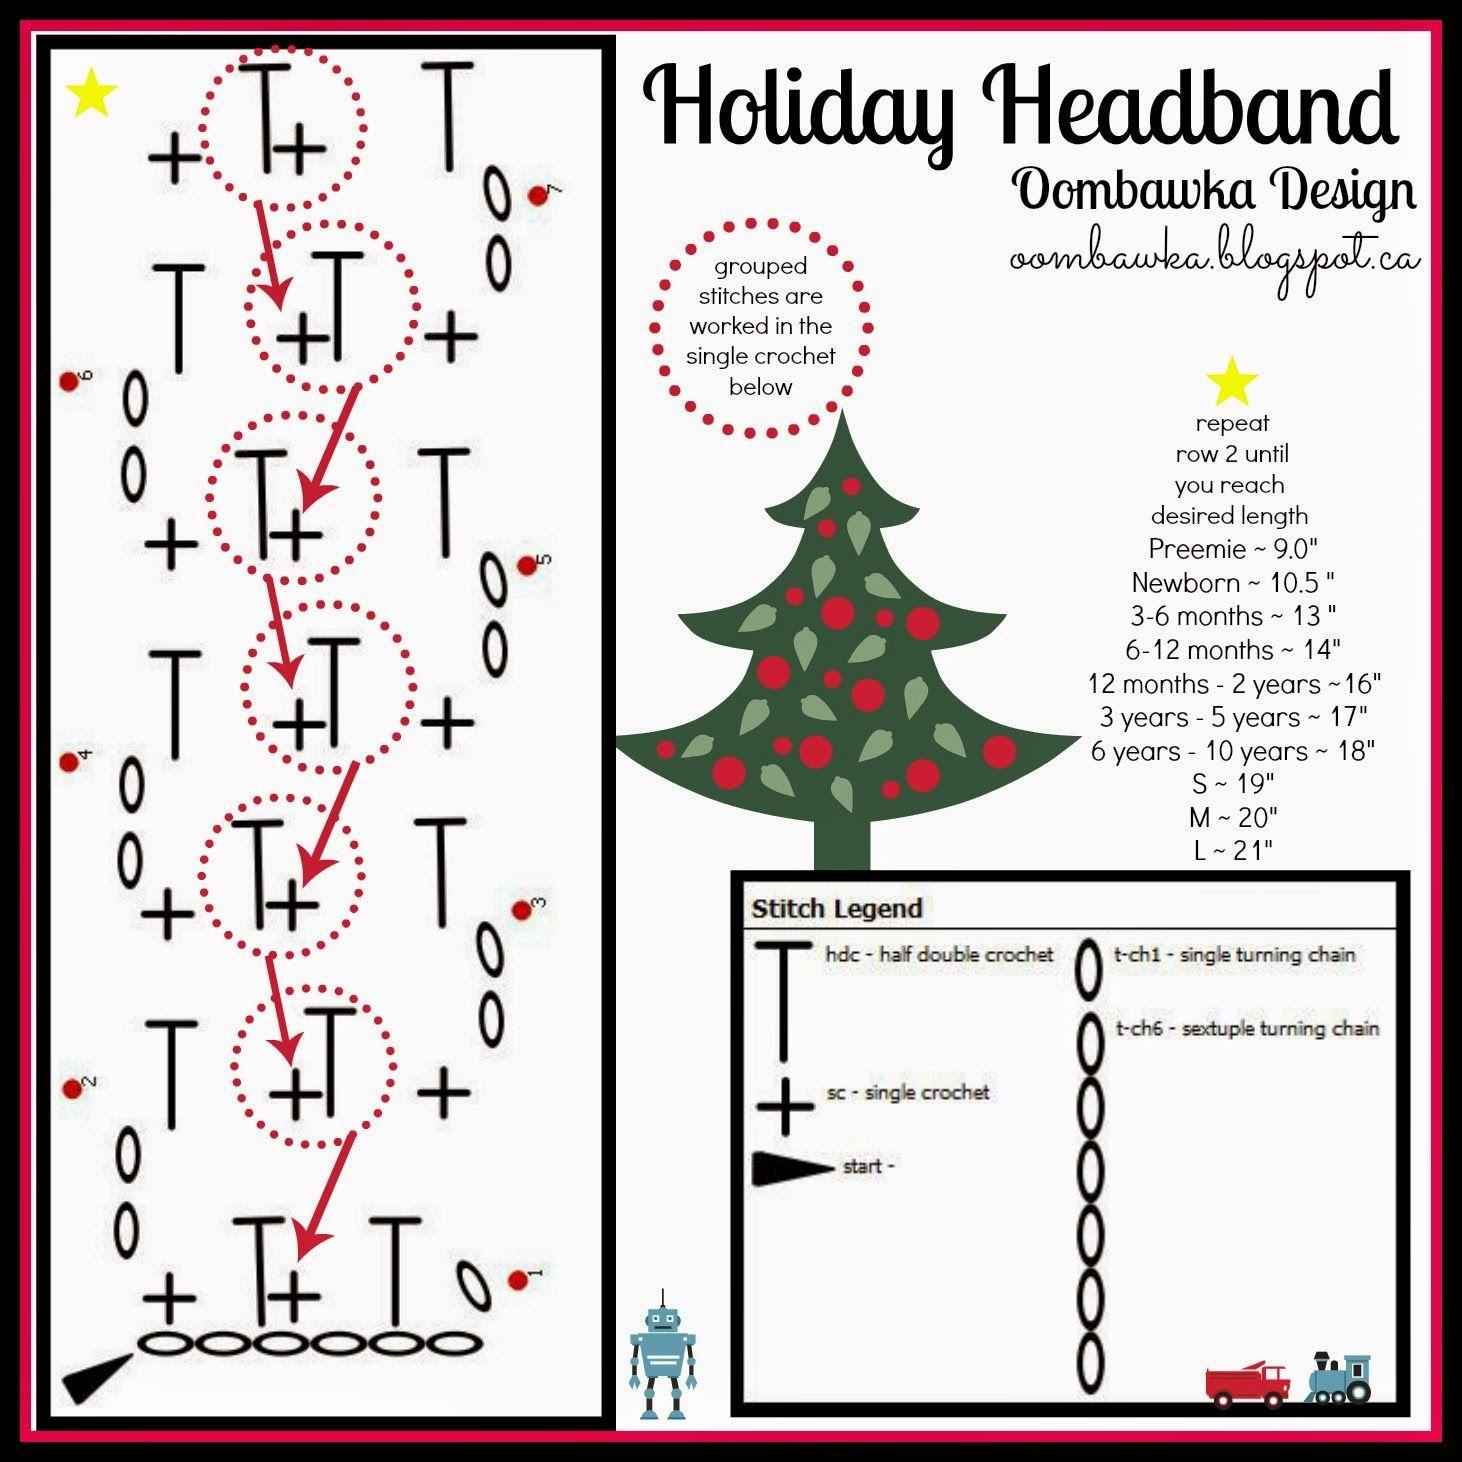 Holiday Headband - Free Crochet Pattern | Pinterest